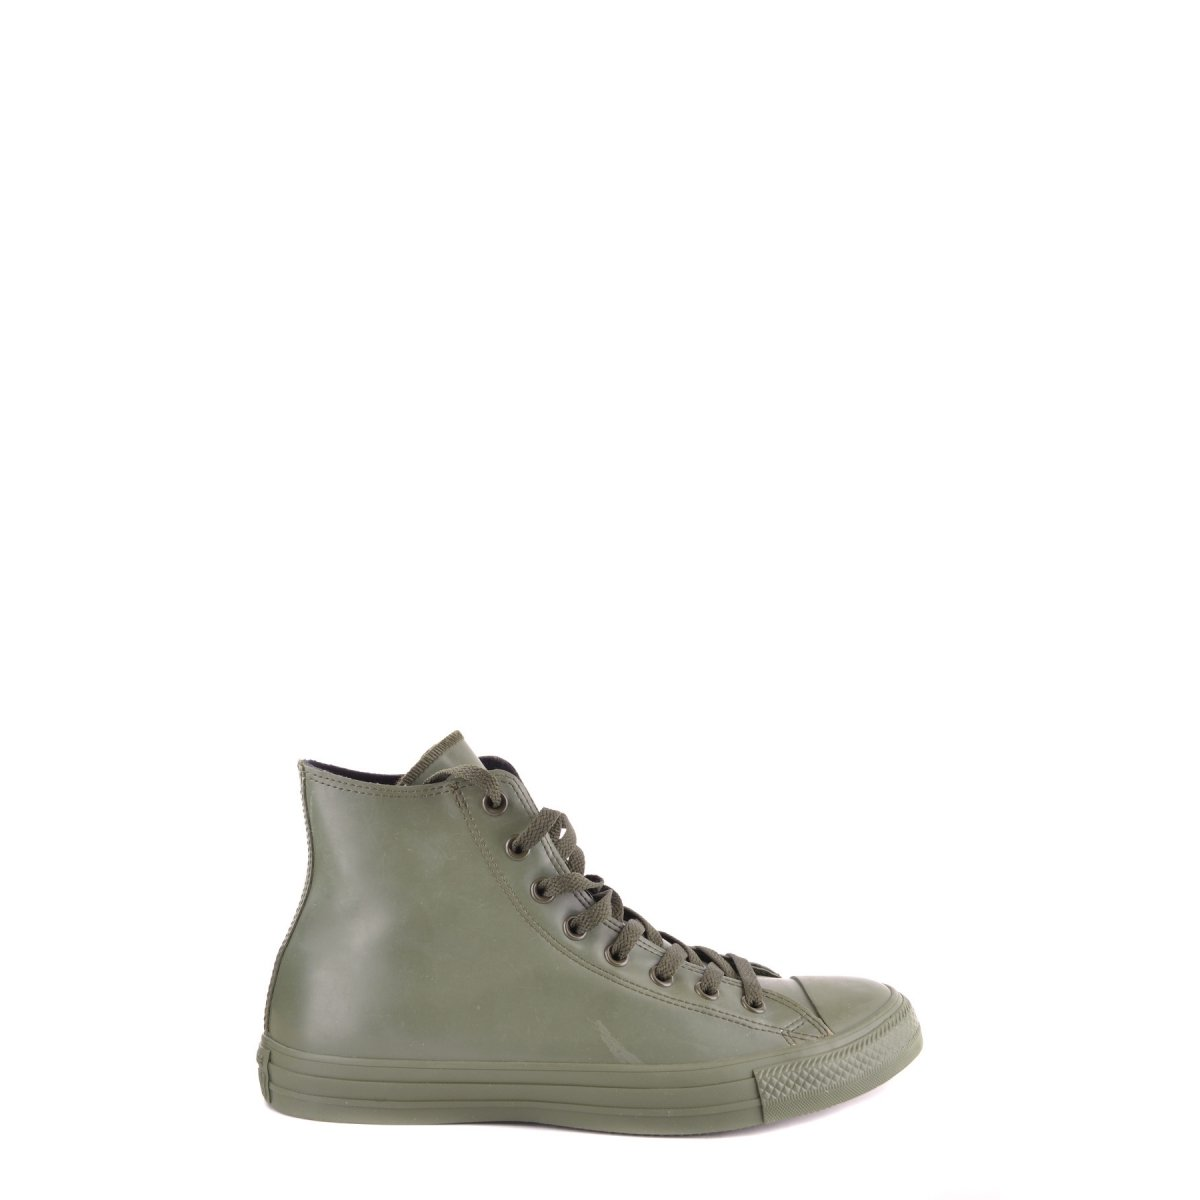 Converse Schuhe Chuck Taylor All Star Rubber Verdone Monochrome 155156C